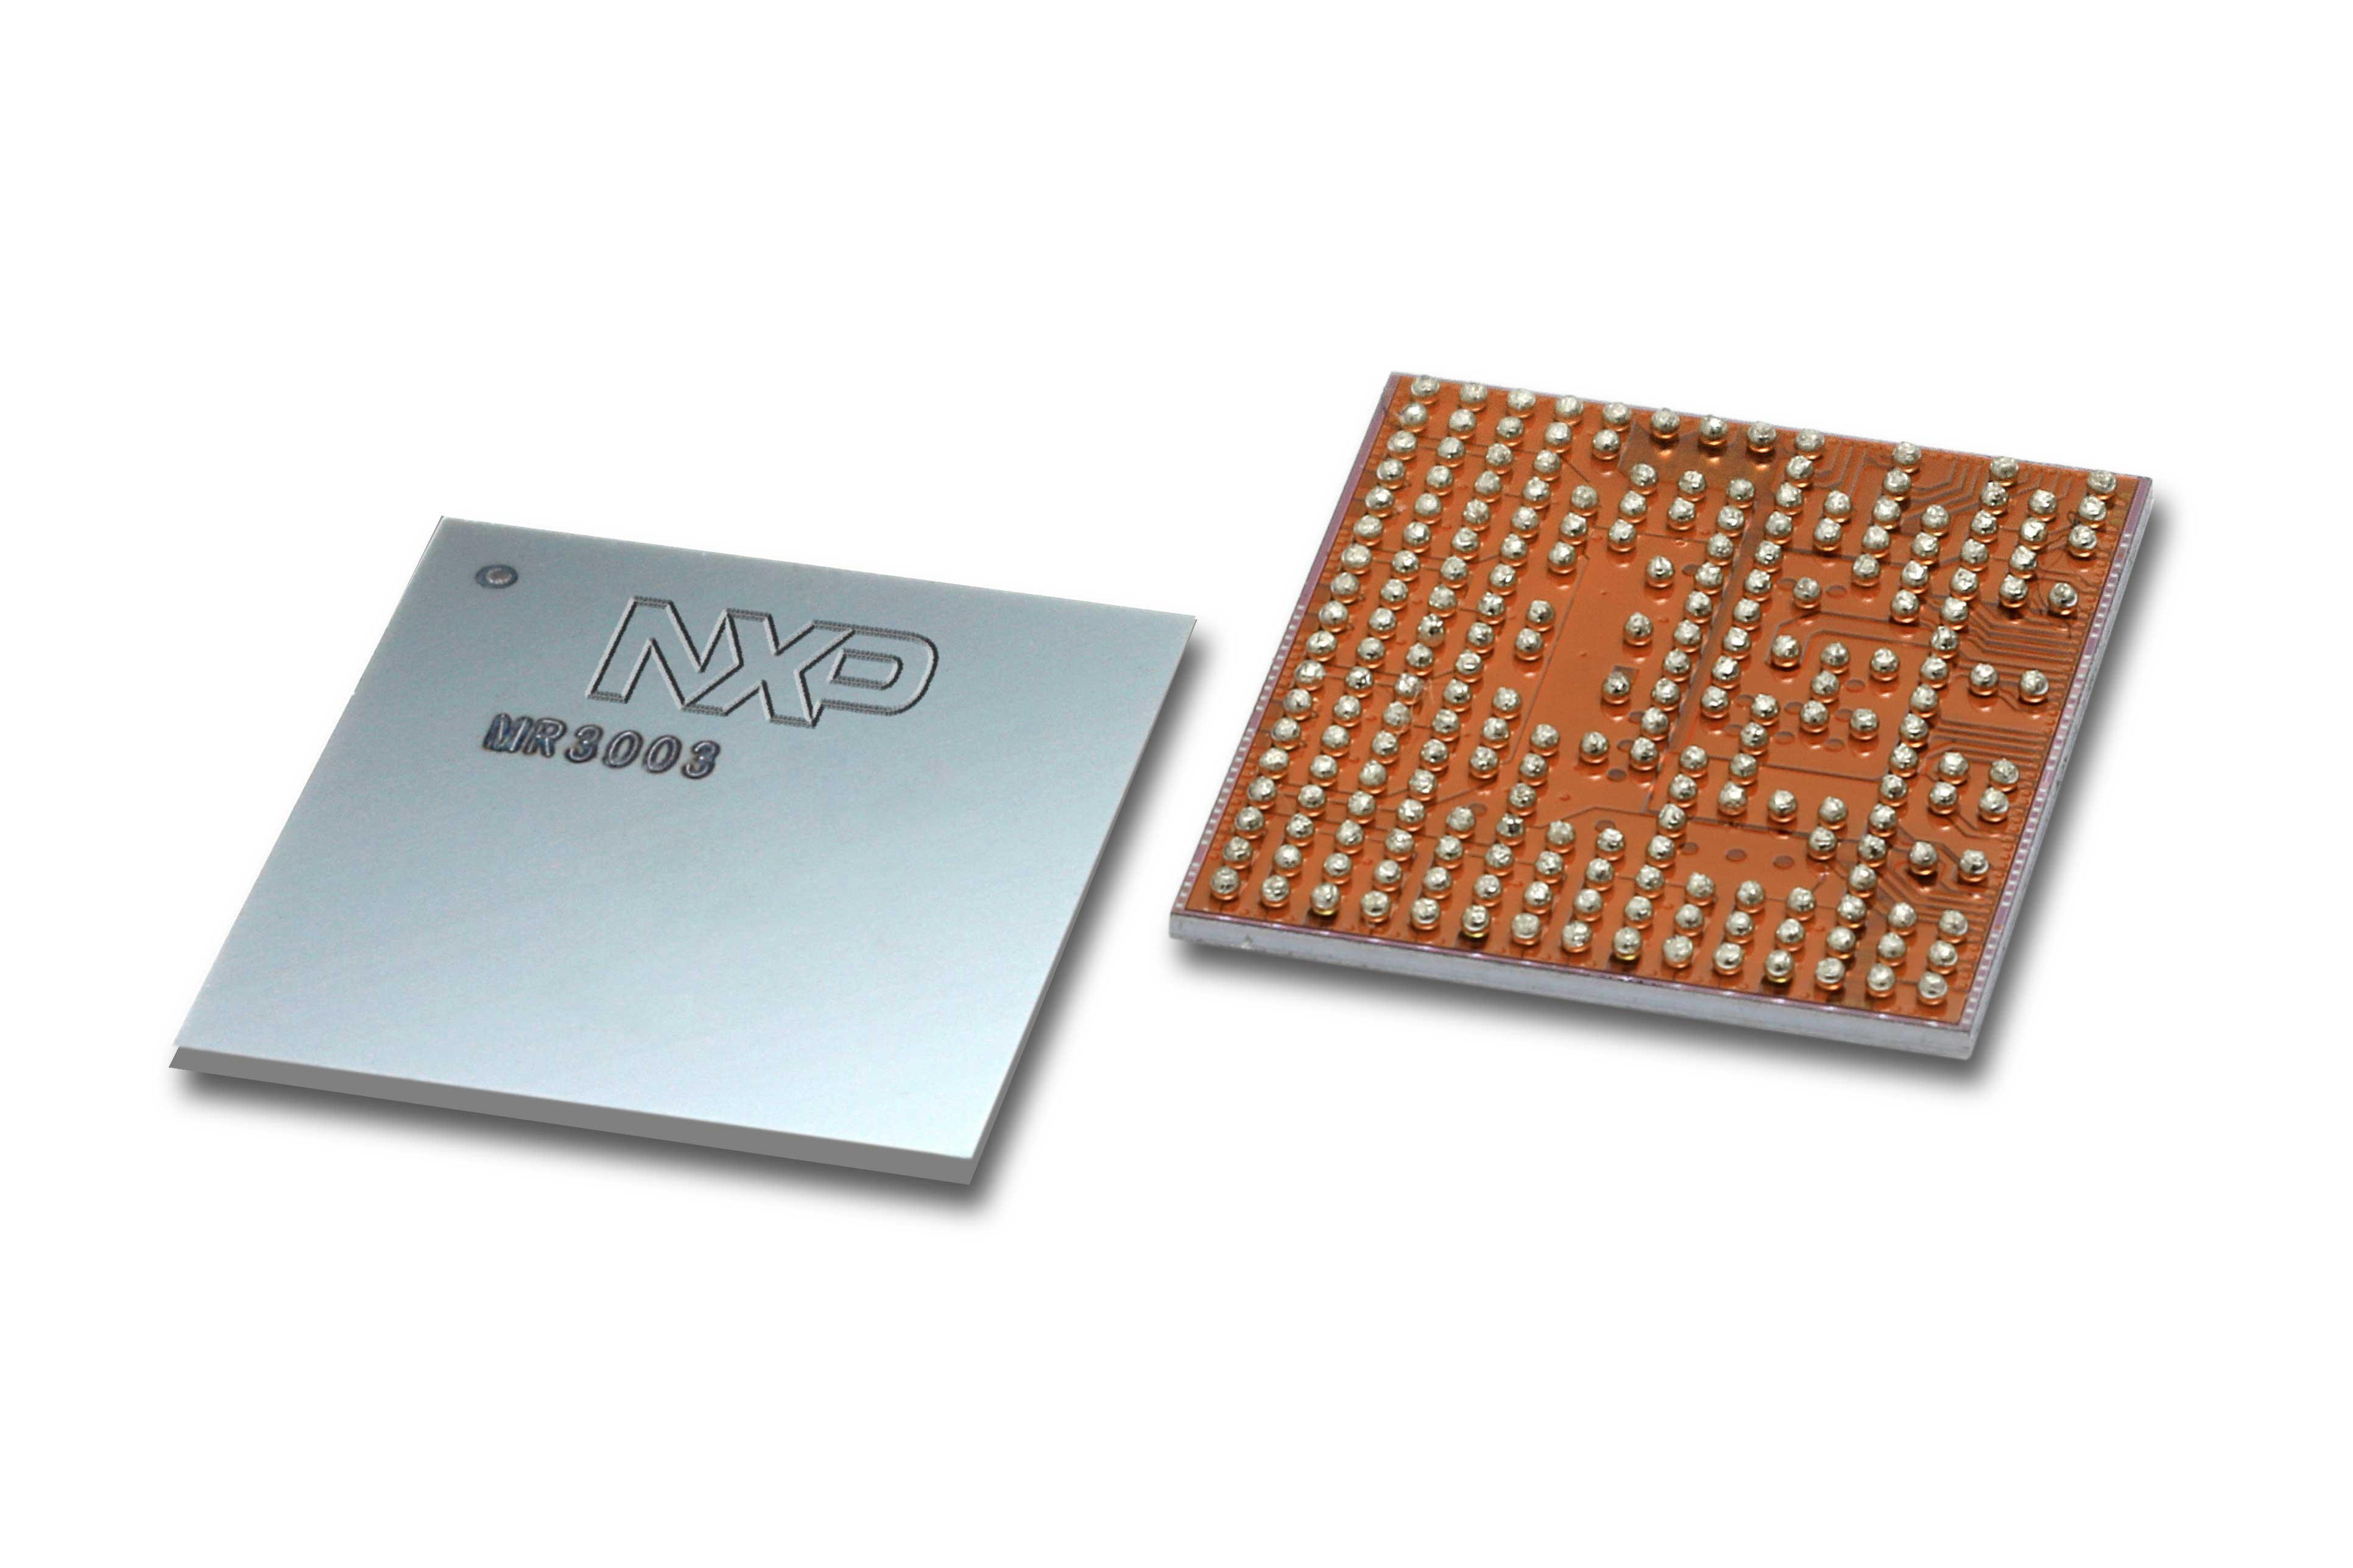 Mr3003 High Performance 77 Ghz Radar Transceiver Nxp Mediumpower Fm Transmitter Eeweb Community